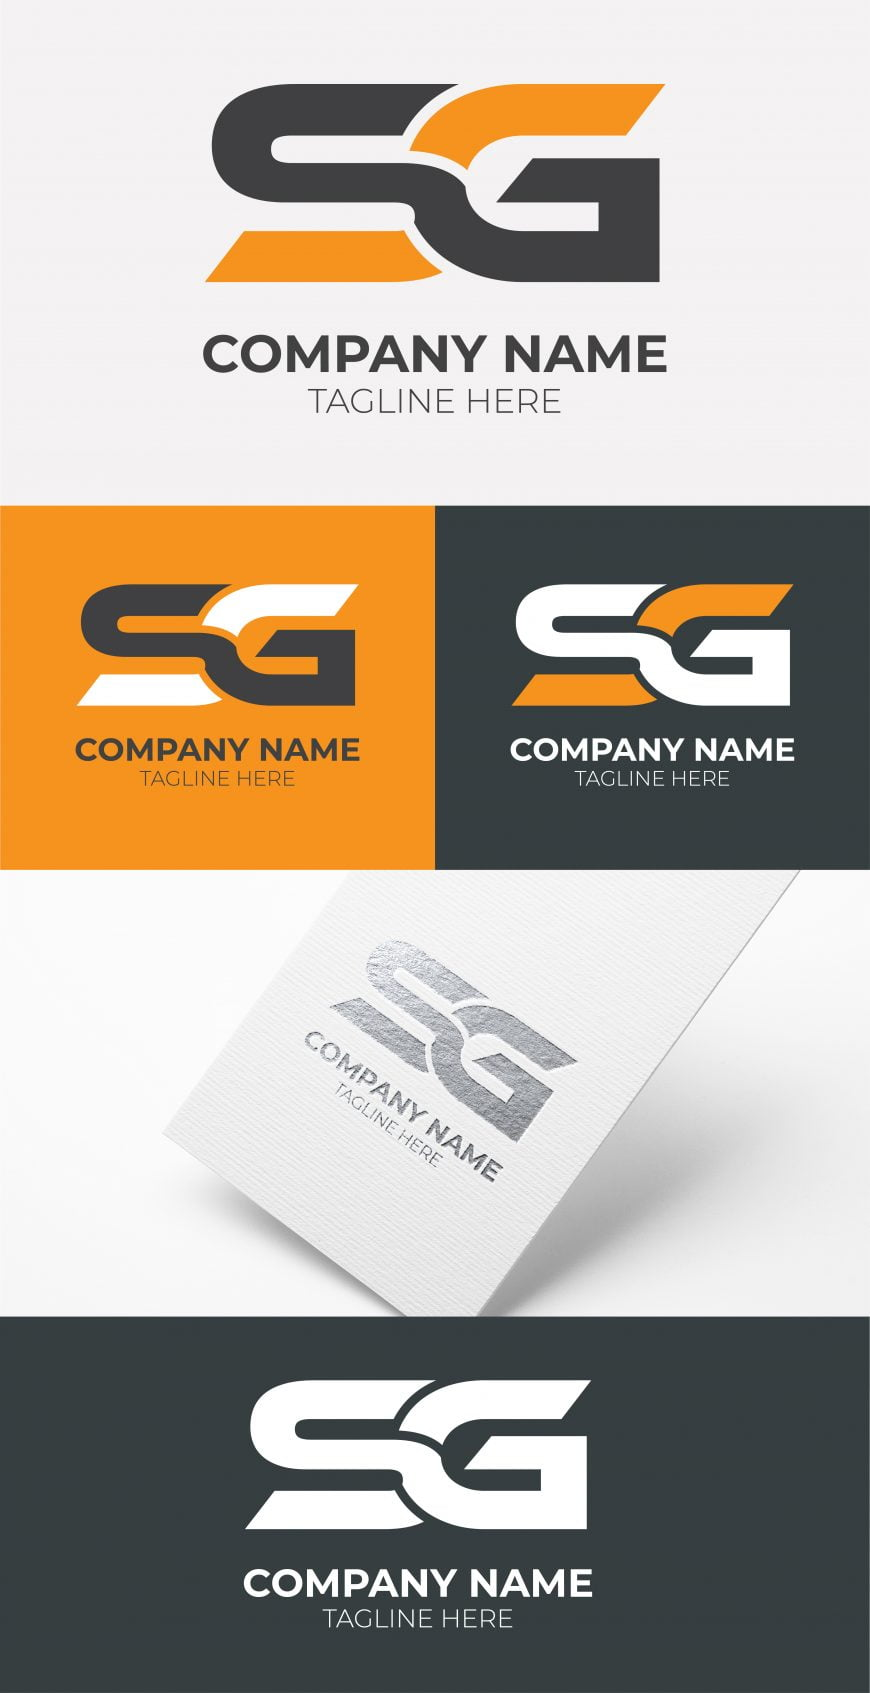 SG-LOGO-DESIGN-FREE-TEMPLATE-scaled